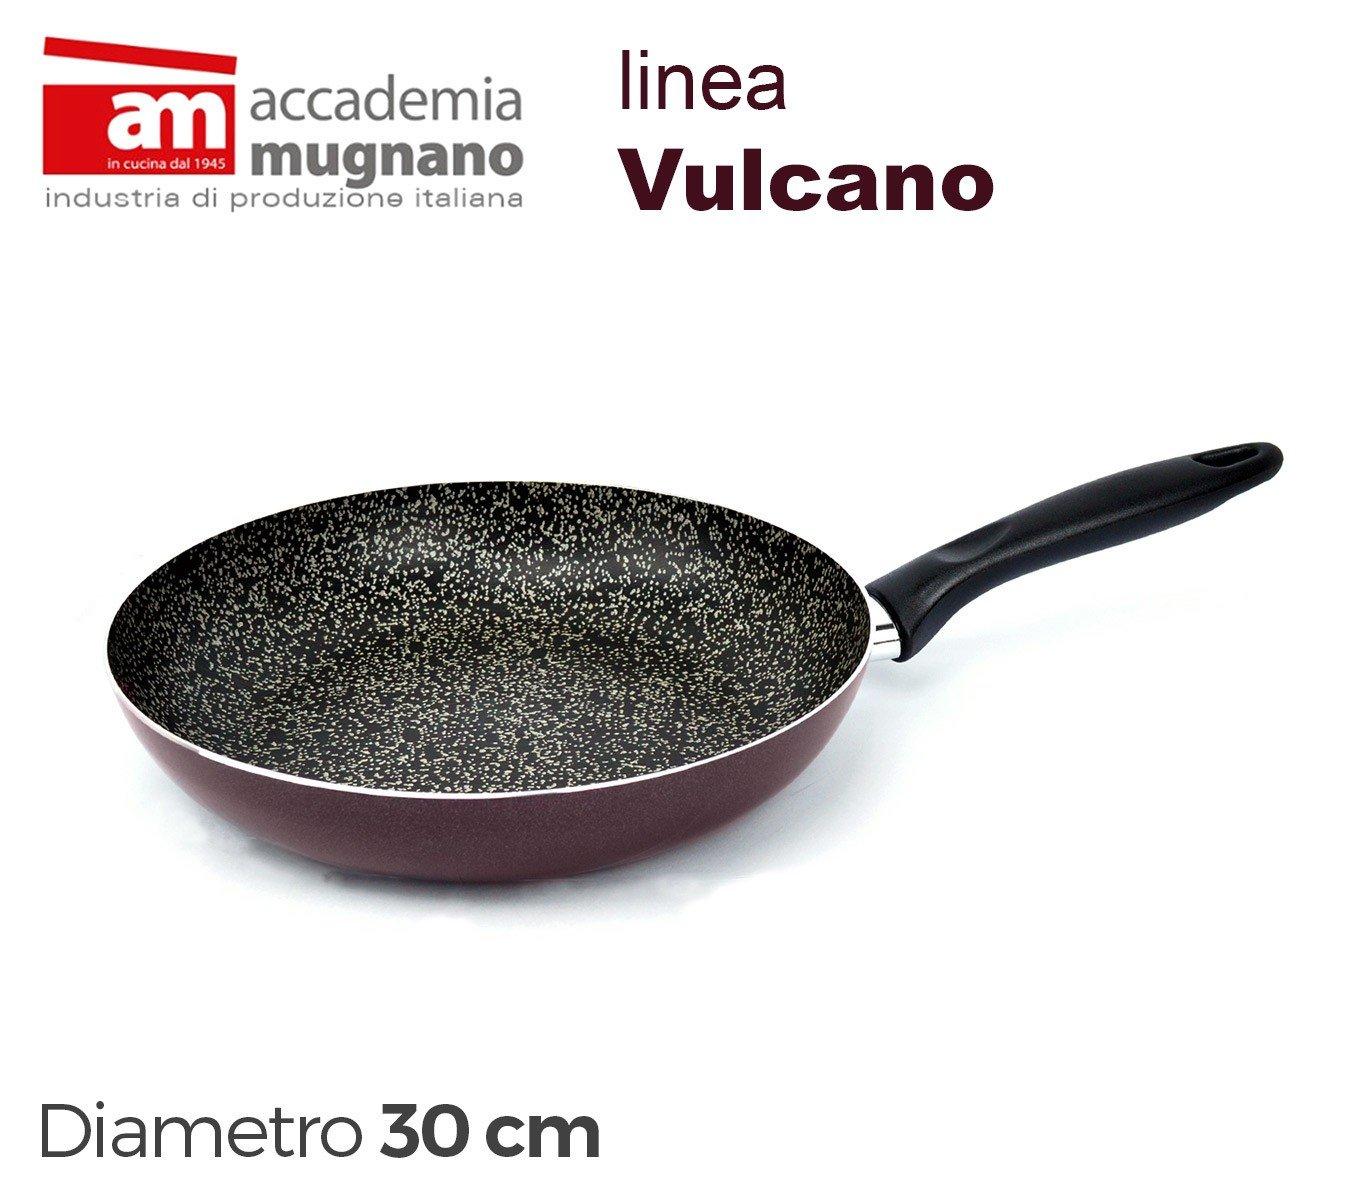 MWS2637 - VUPDL30 Sartén antiadherente - Accademia Mugnano linea Vulcano 30cm efecto piedra: Amazon.es: Hogar